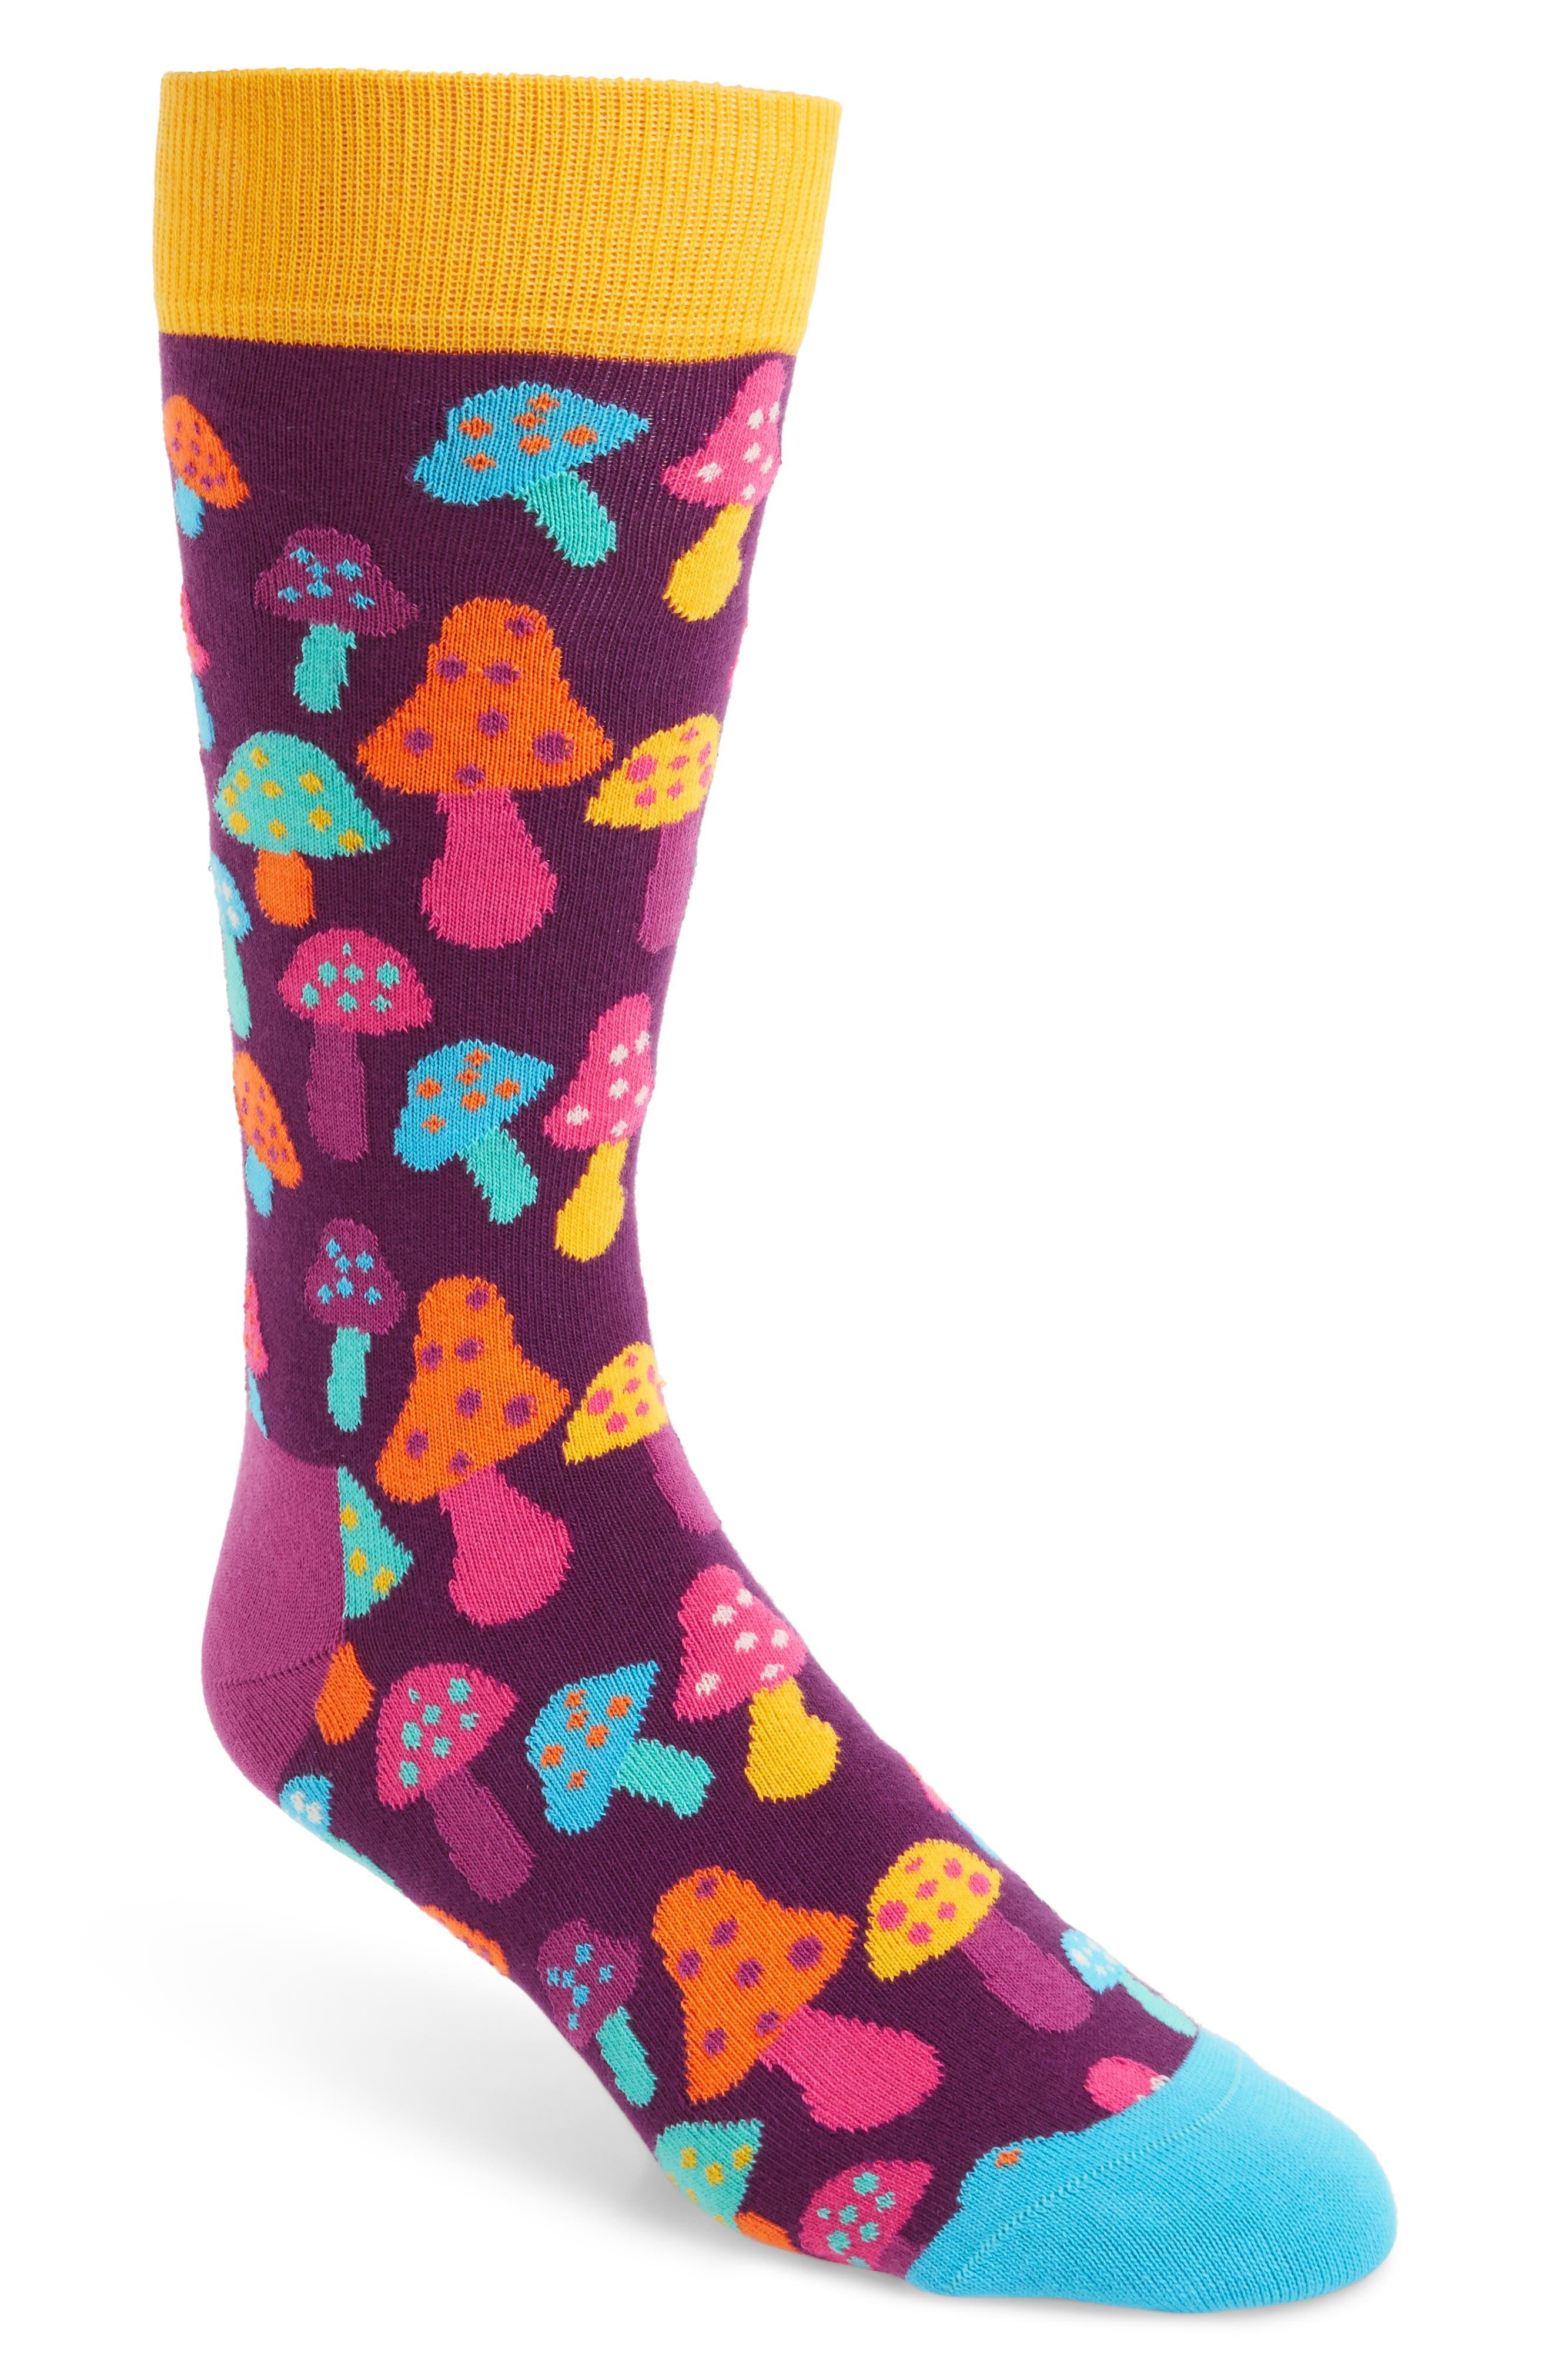 Mushroom Socks,                             Main thumbnail 1, color,                             510